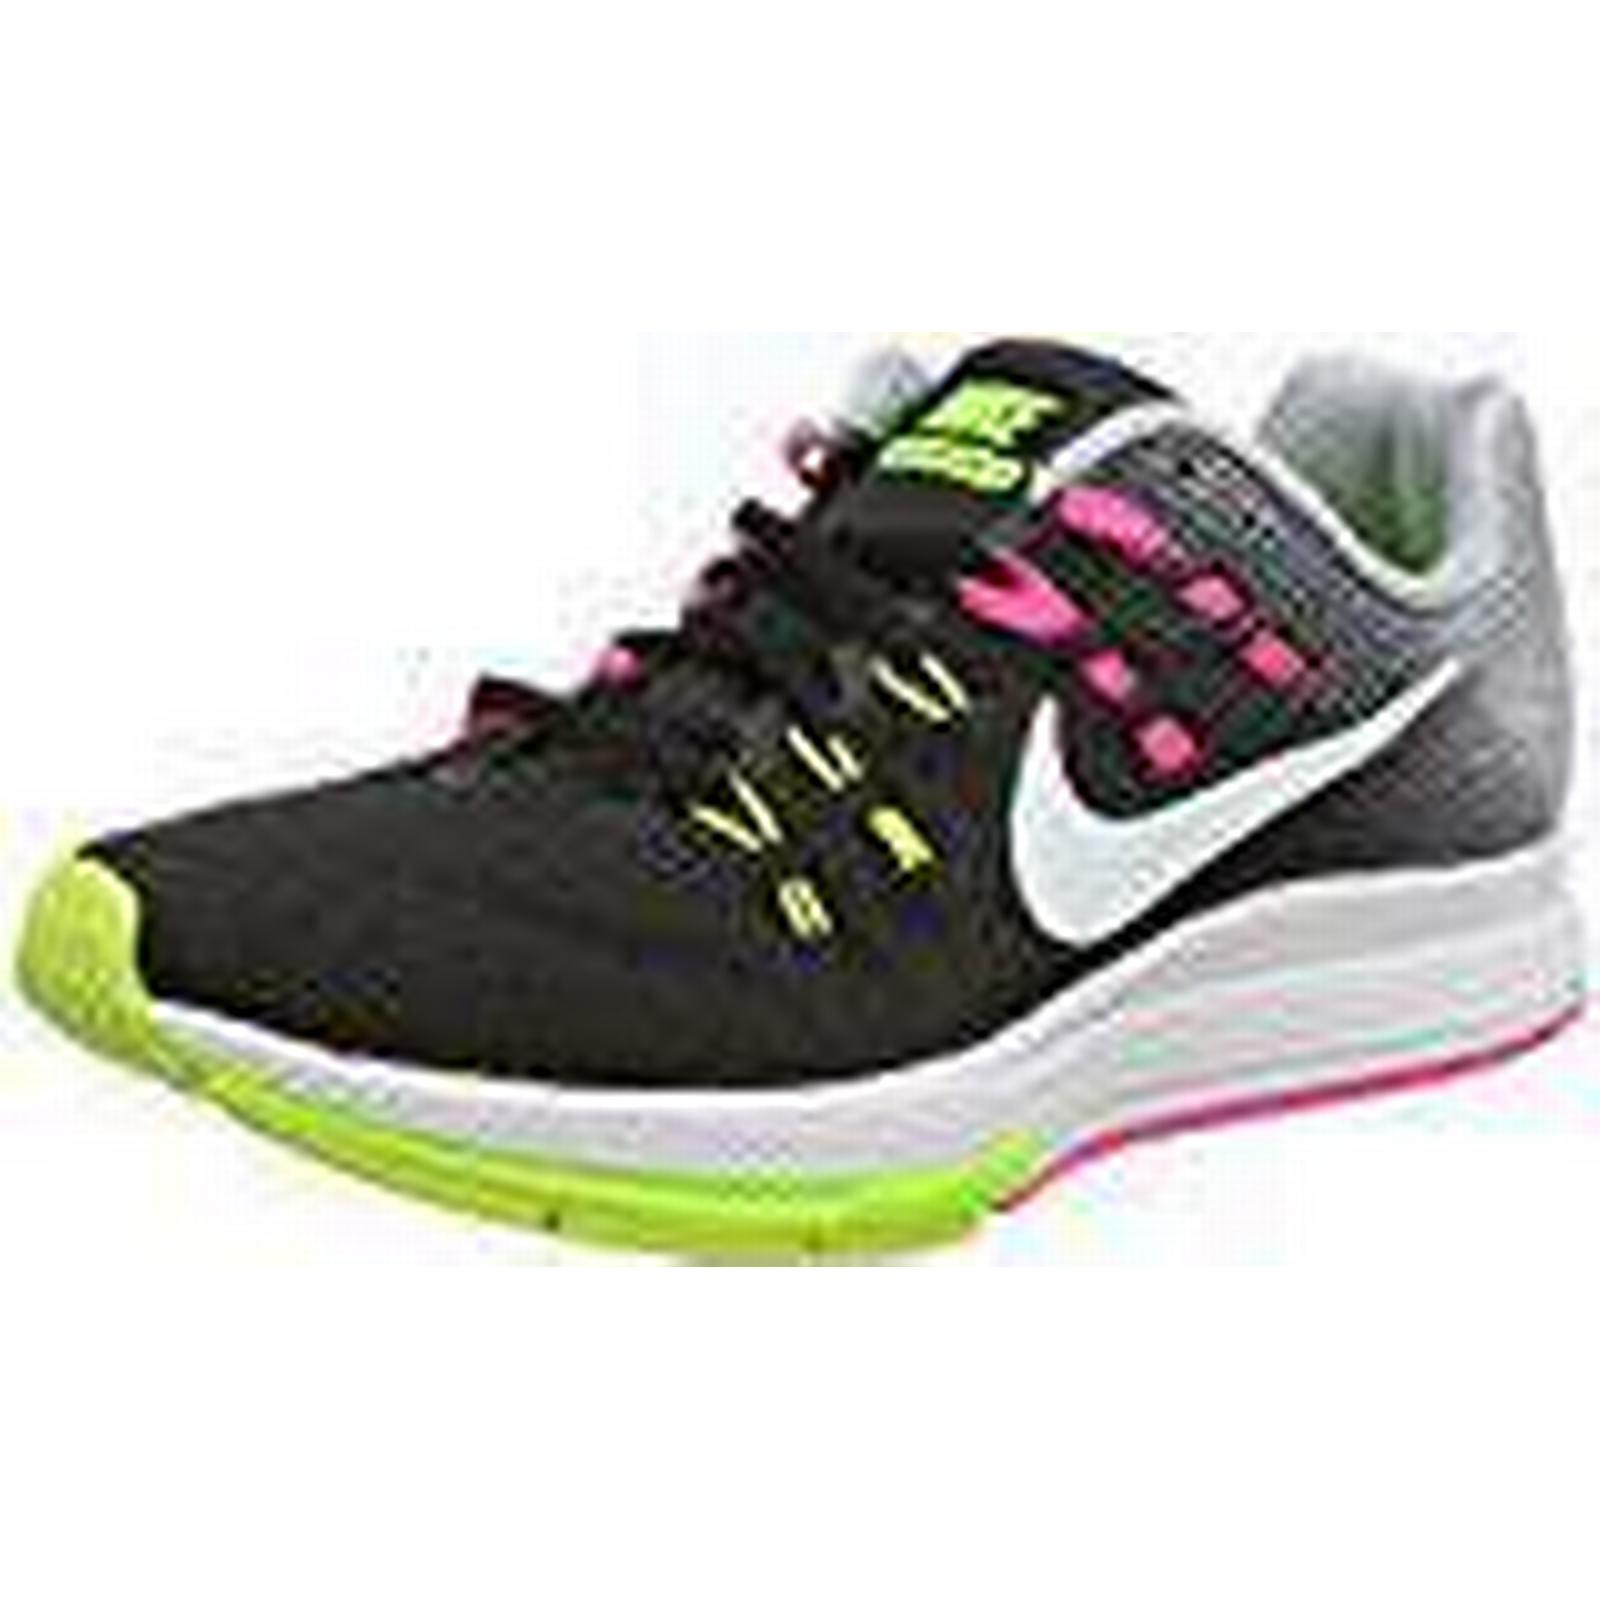 NIKE Women's Air Zoom Structure 19 Running Shoes, Black (Black/White/Pink UK Blast/Dark Purple Dust), 4 UK (Black/White/Pink 37 1/2 EU afdae6